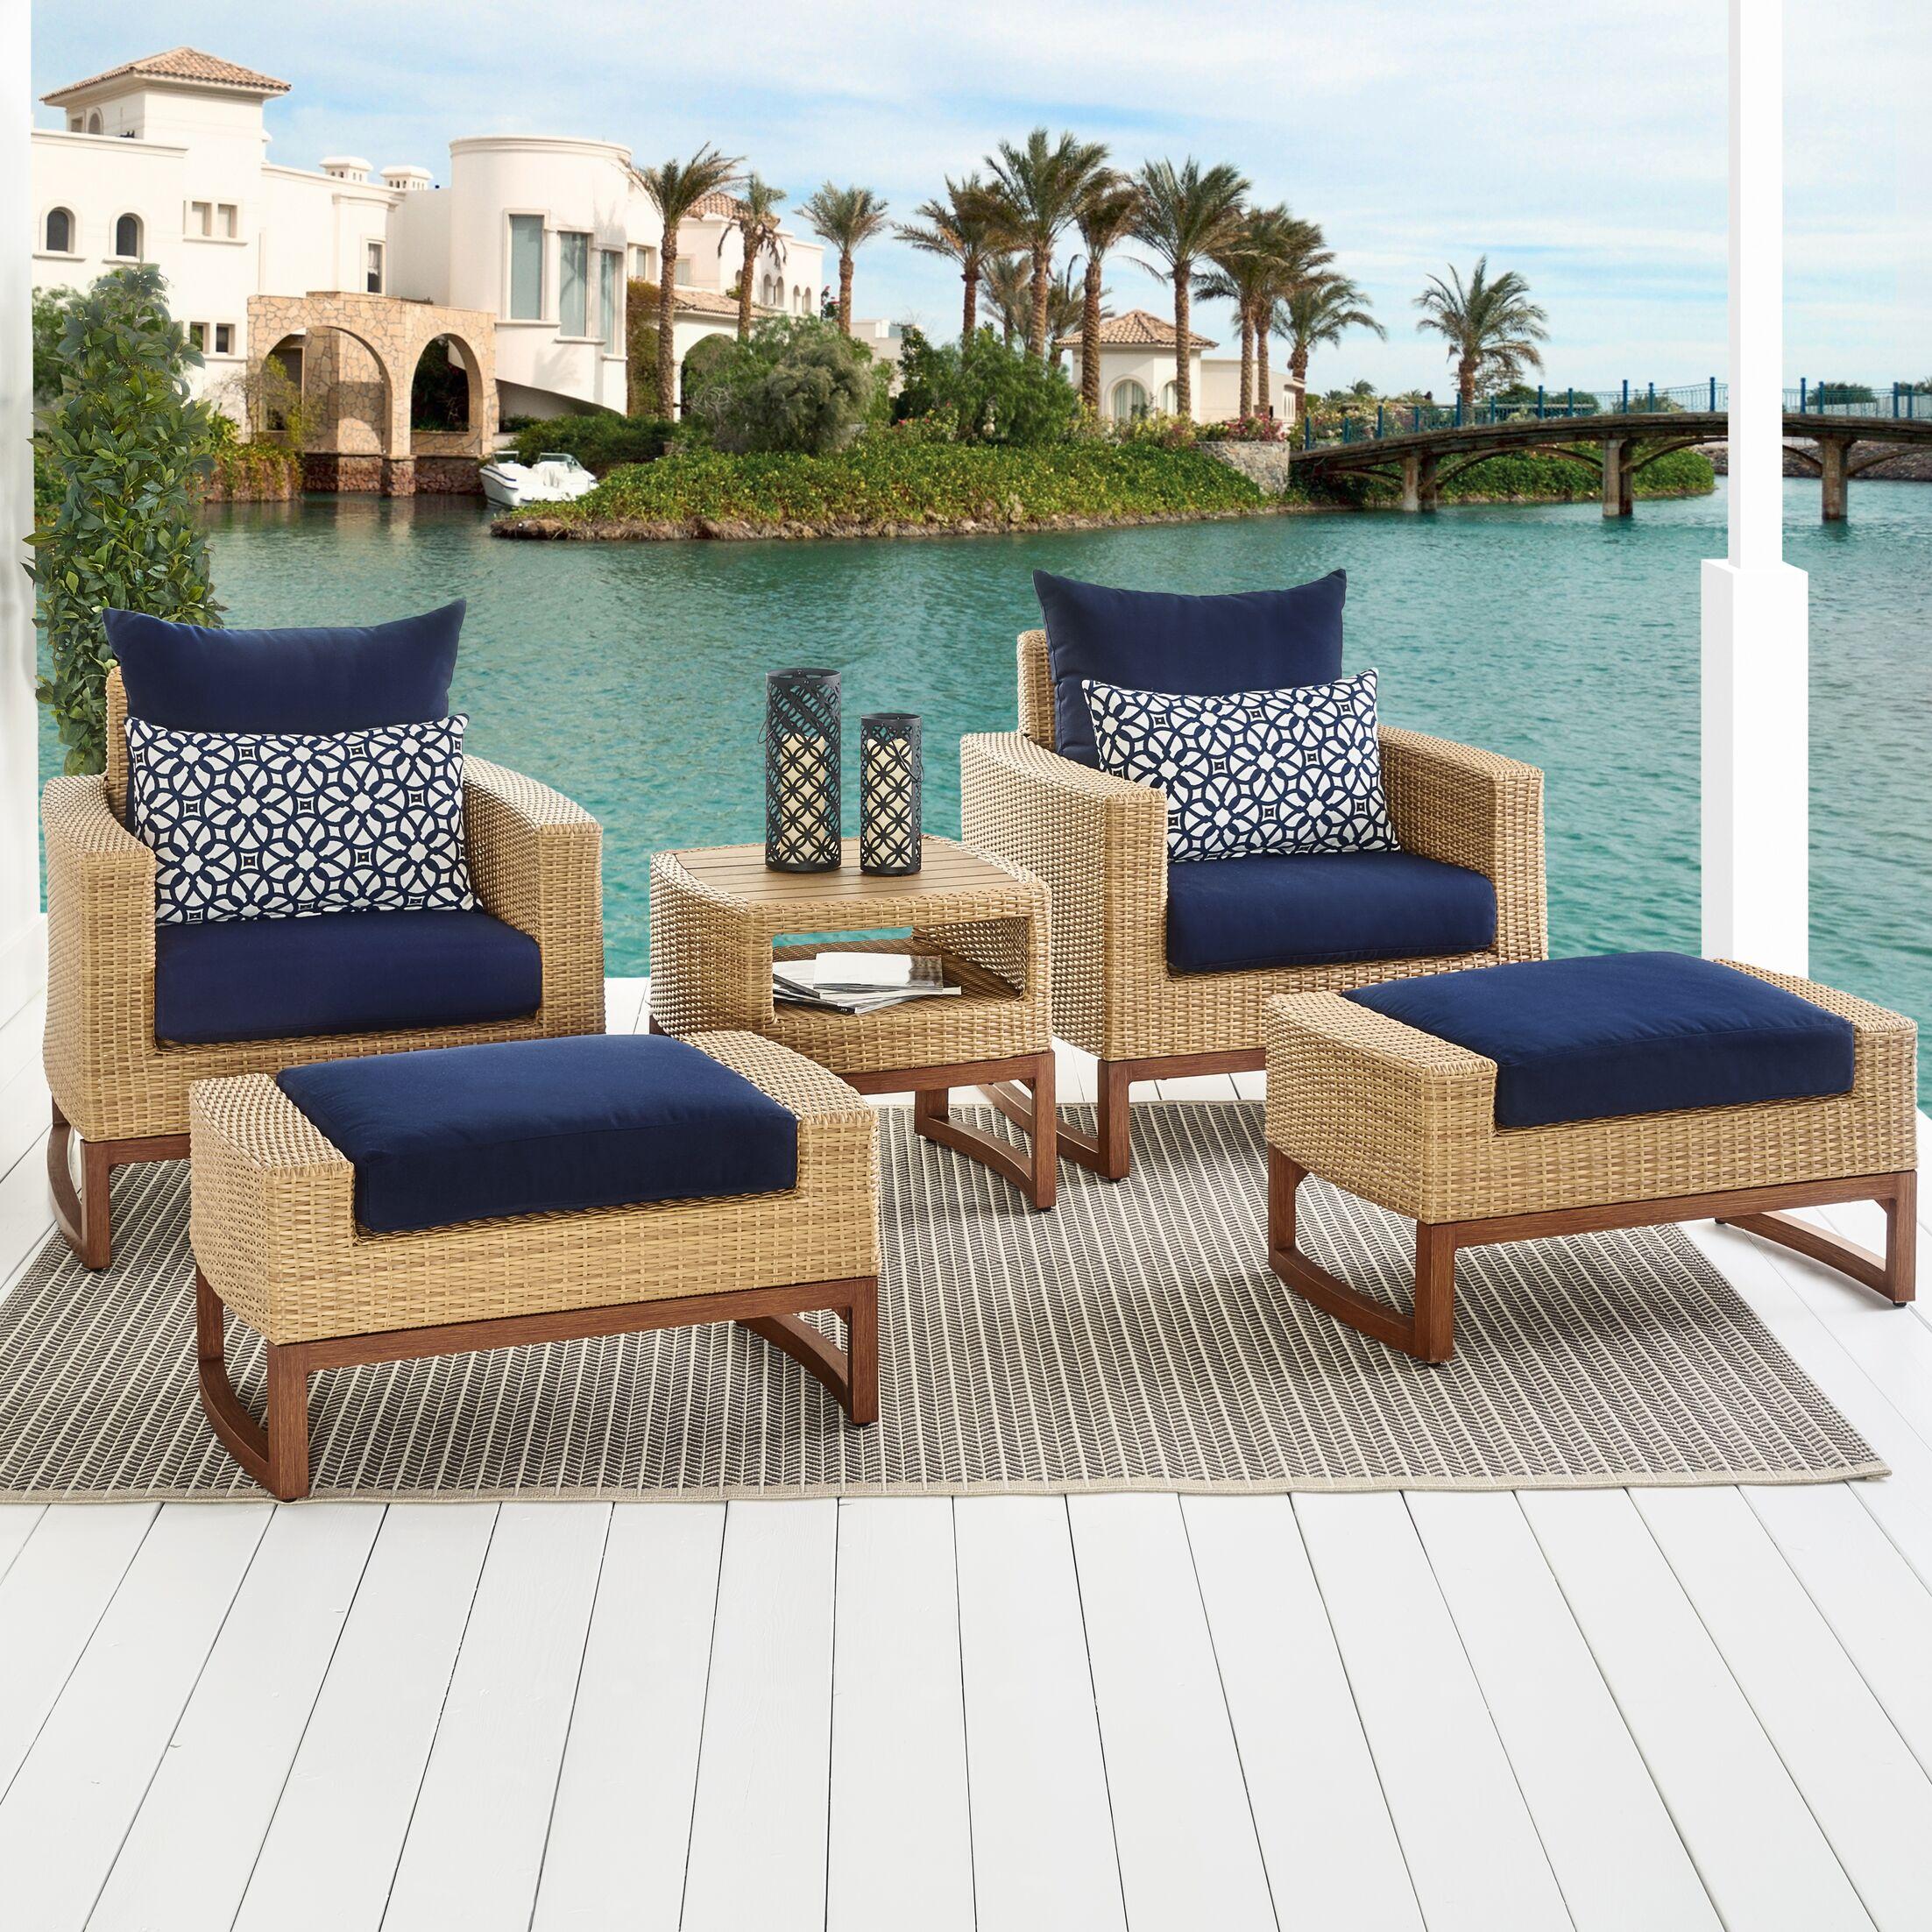 Addison 5 Piece Sunbrella Conversation Set with Cushions Fabric: Navy Blue